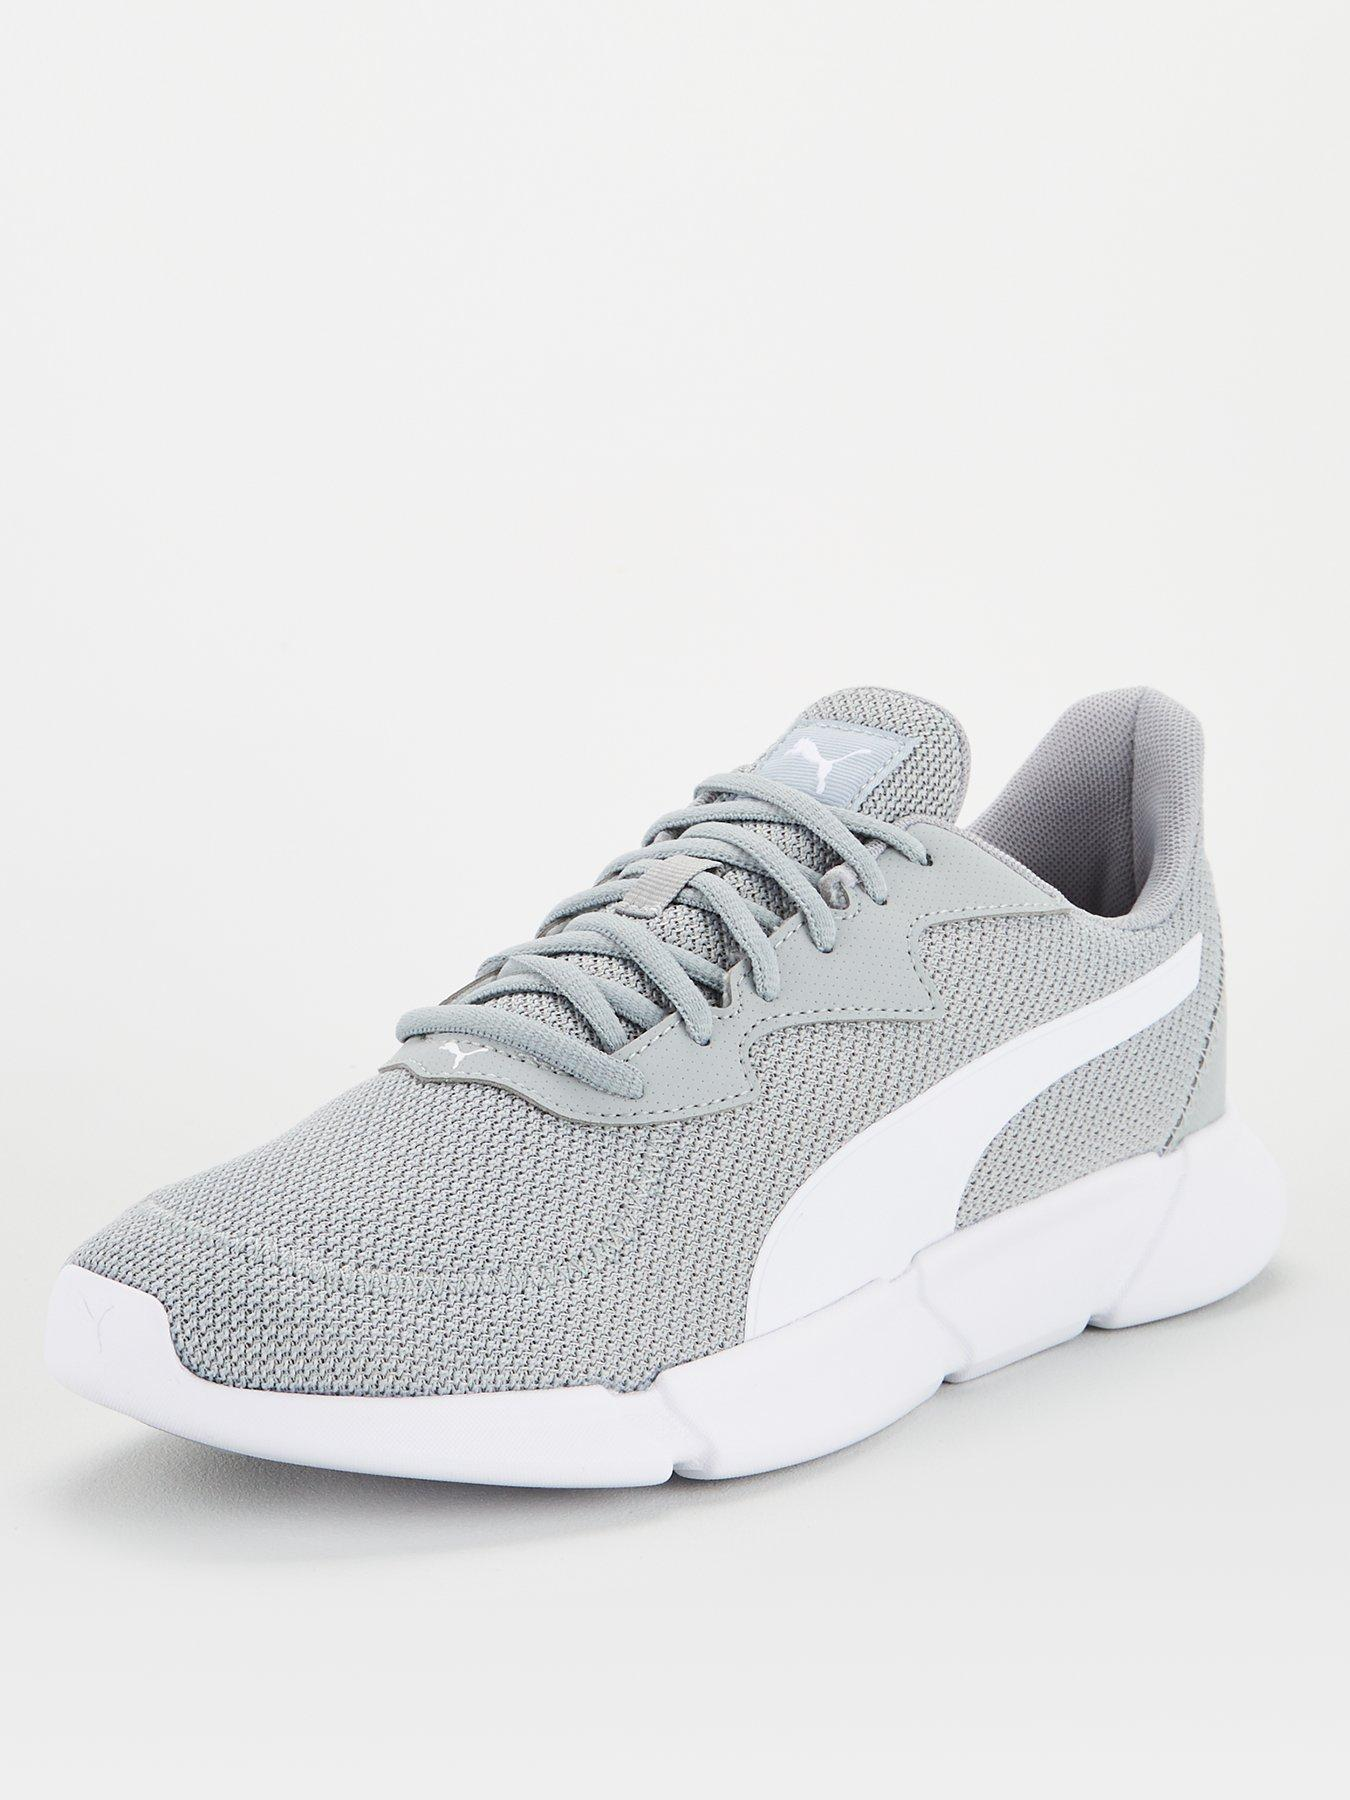 Grey | Puma | Mens trainers | Mens